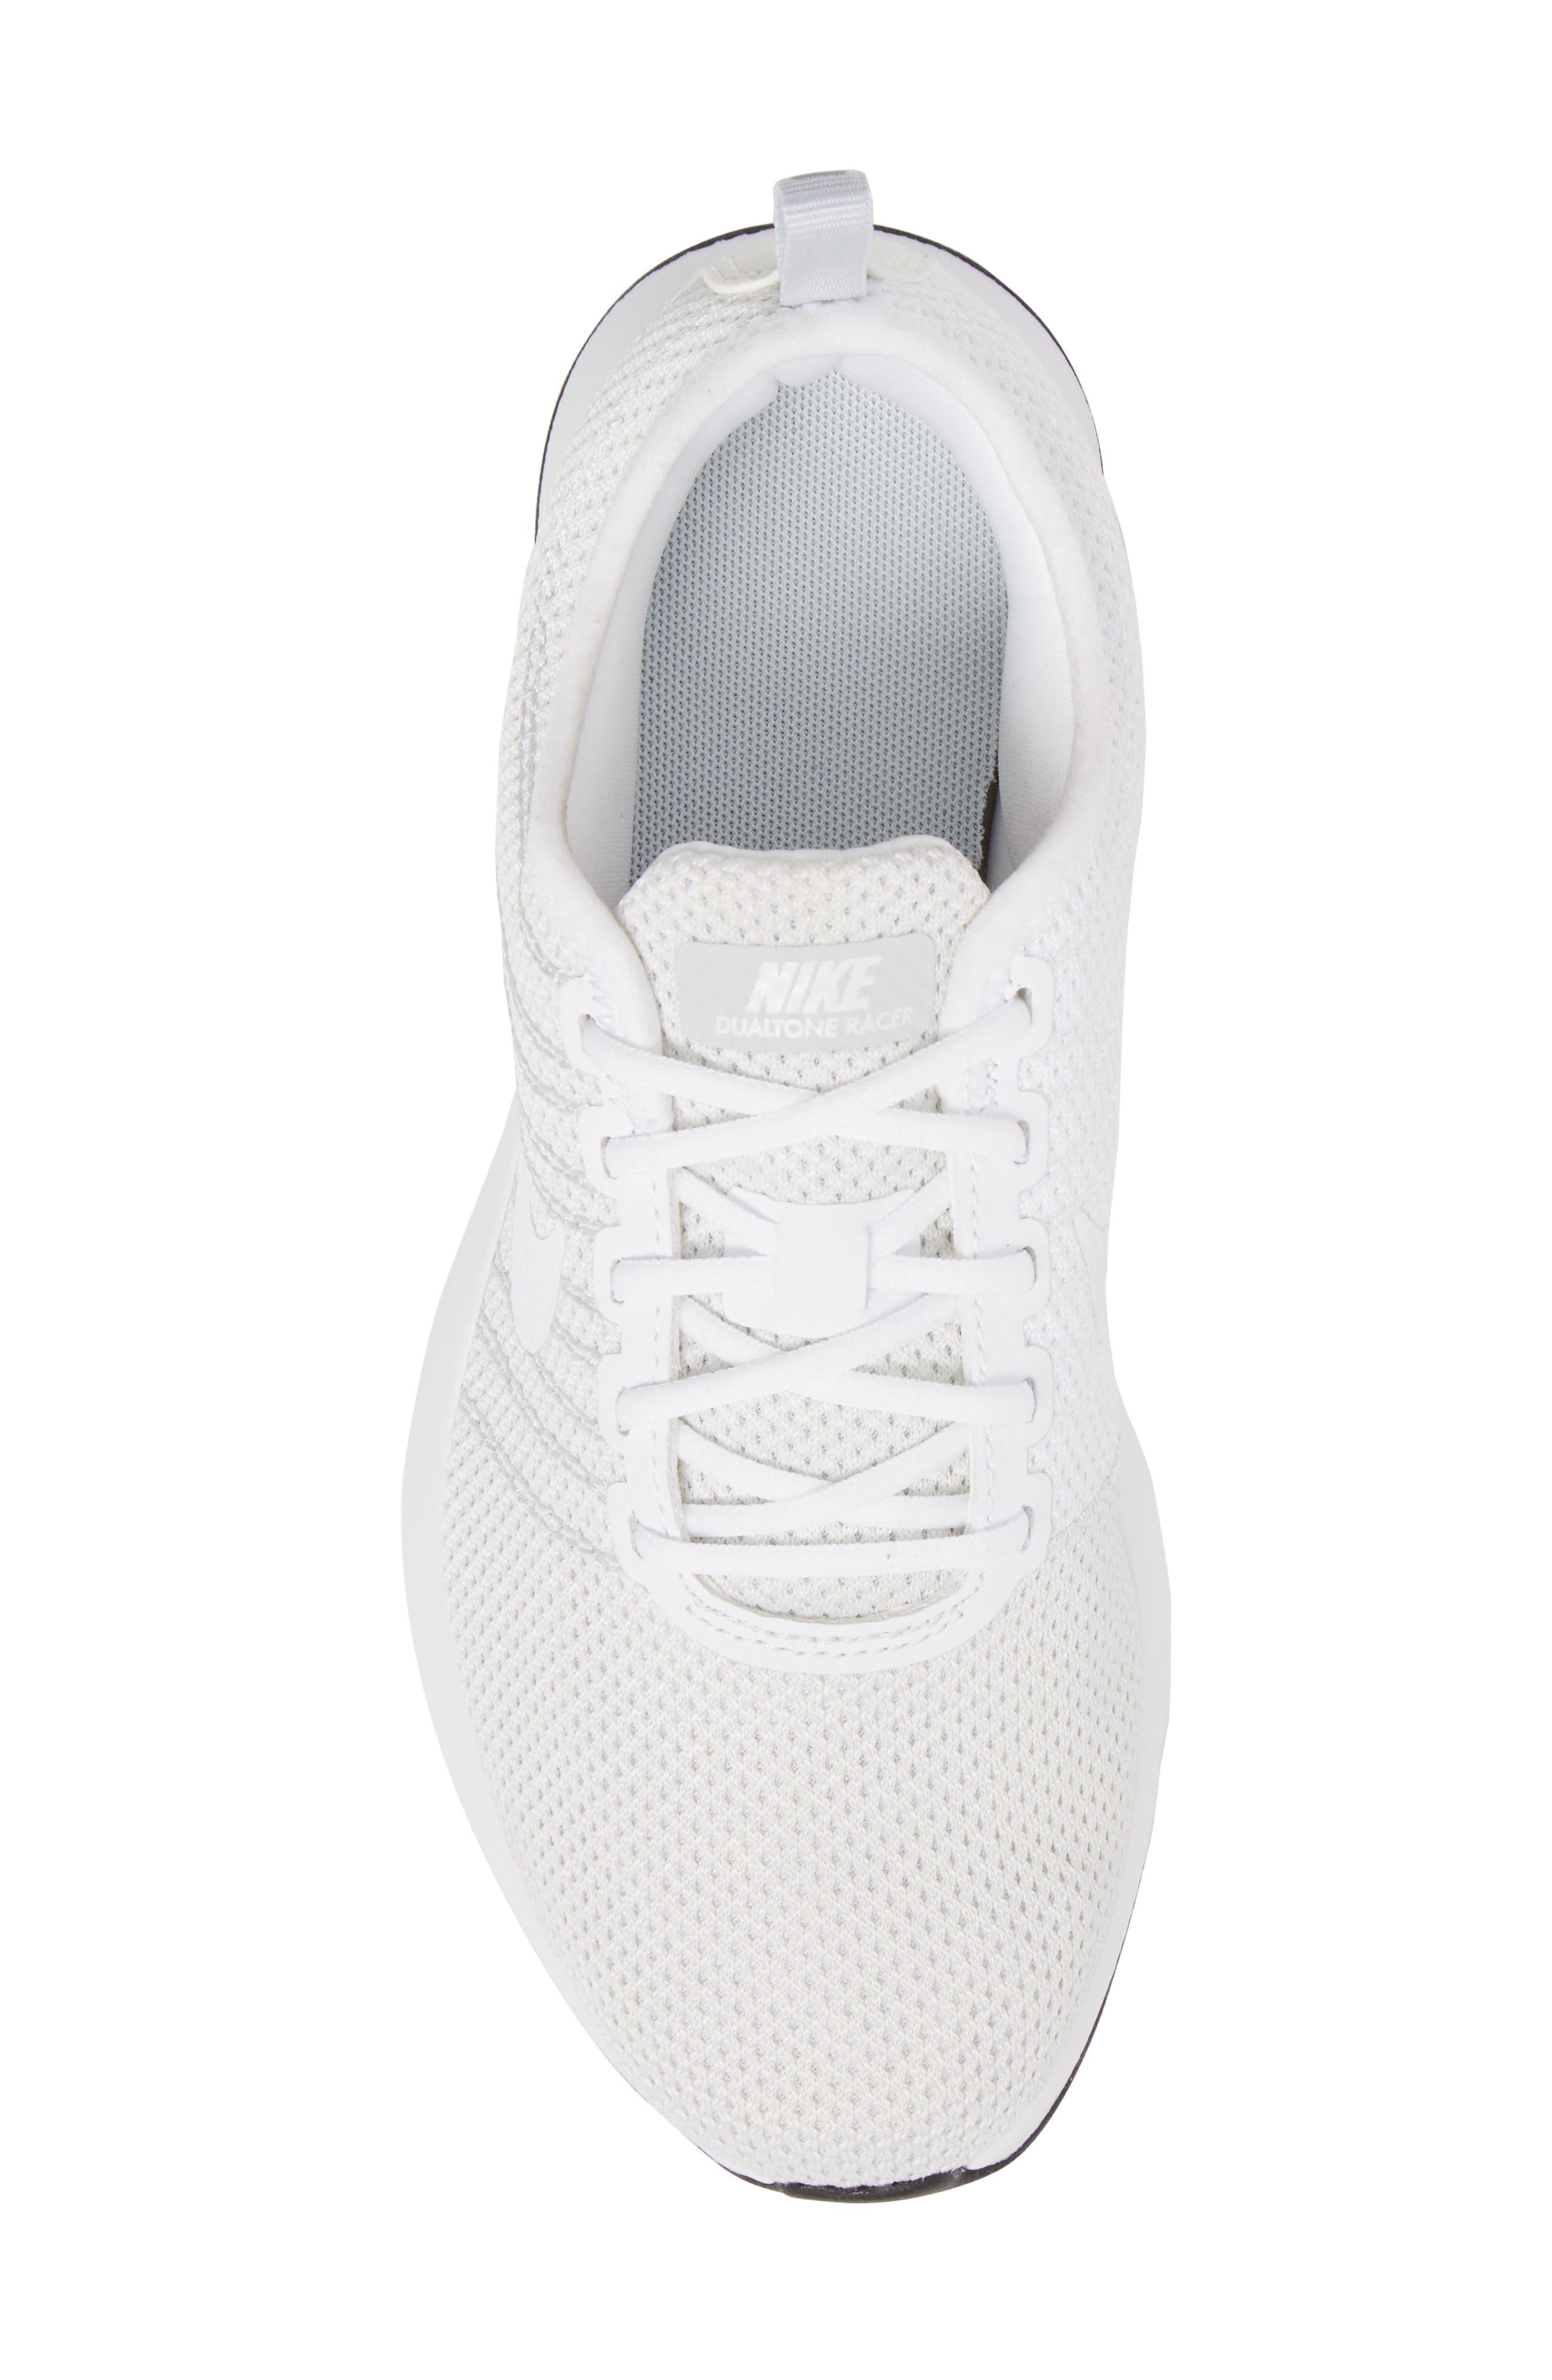 Dualtone Racer GS Sneaker,                             Alternate thumbnail 19, color,